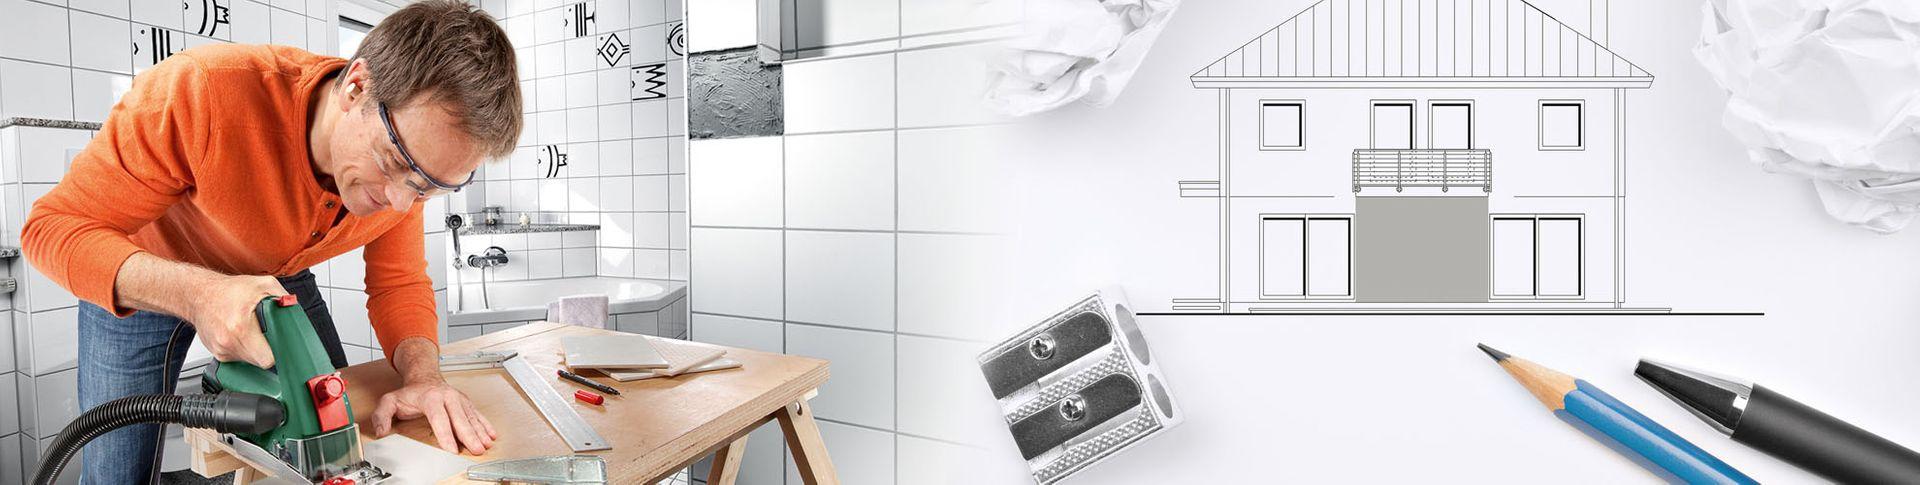 haus konfigurator iqhausbau. Black Bedroom Furniture Sets. Home Design Ideas